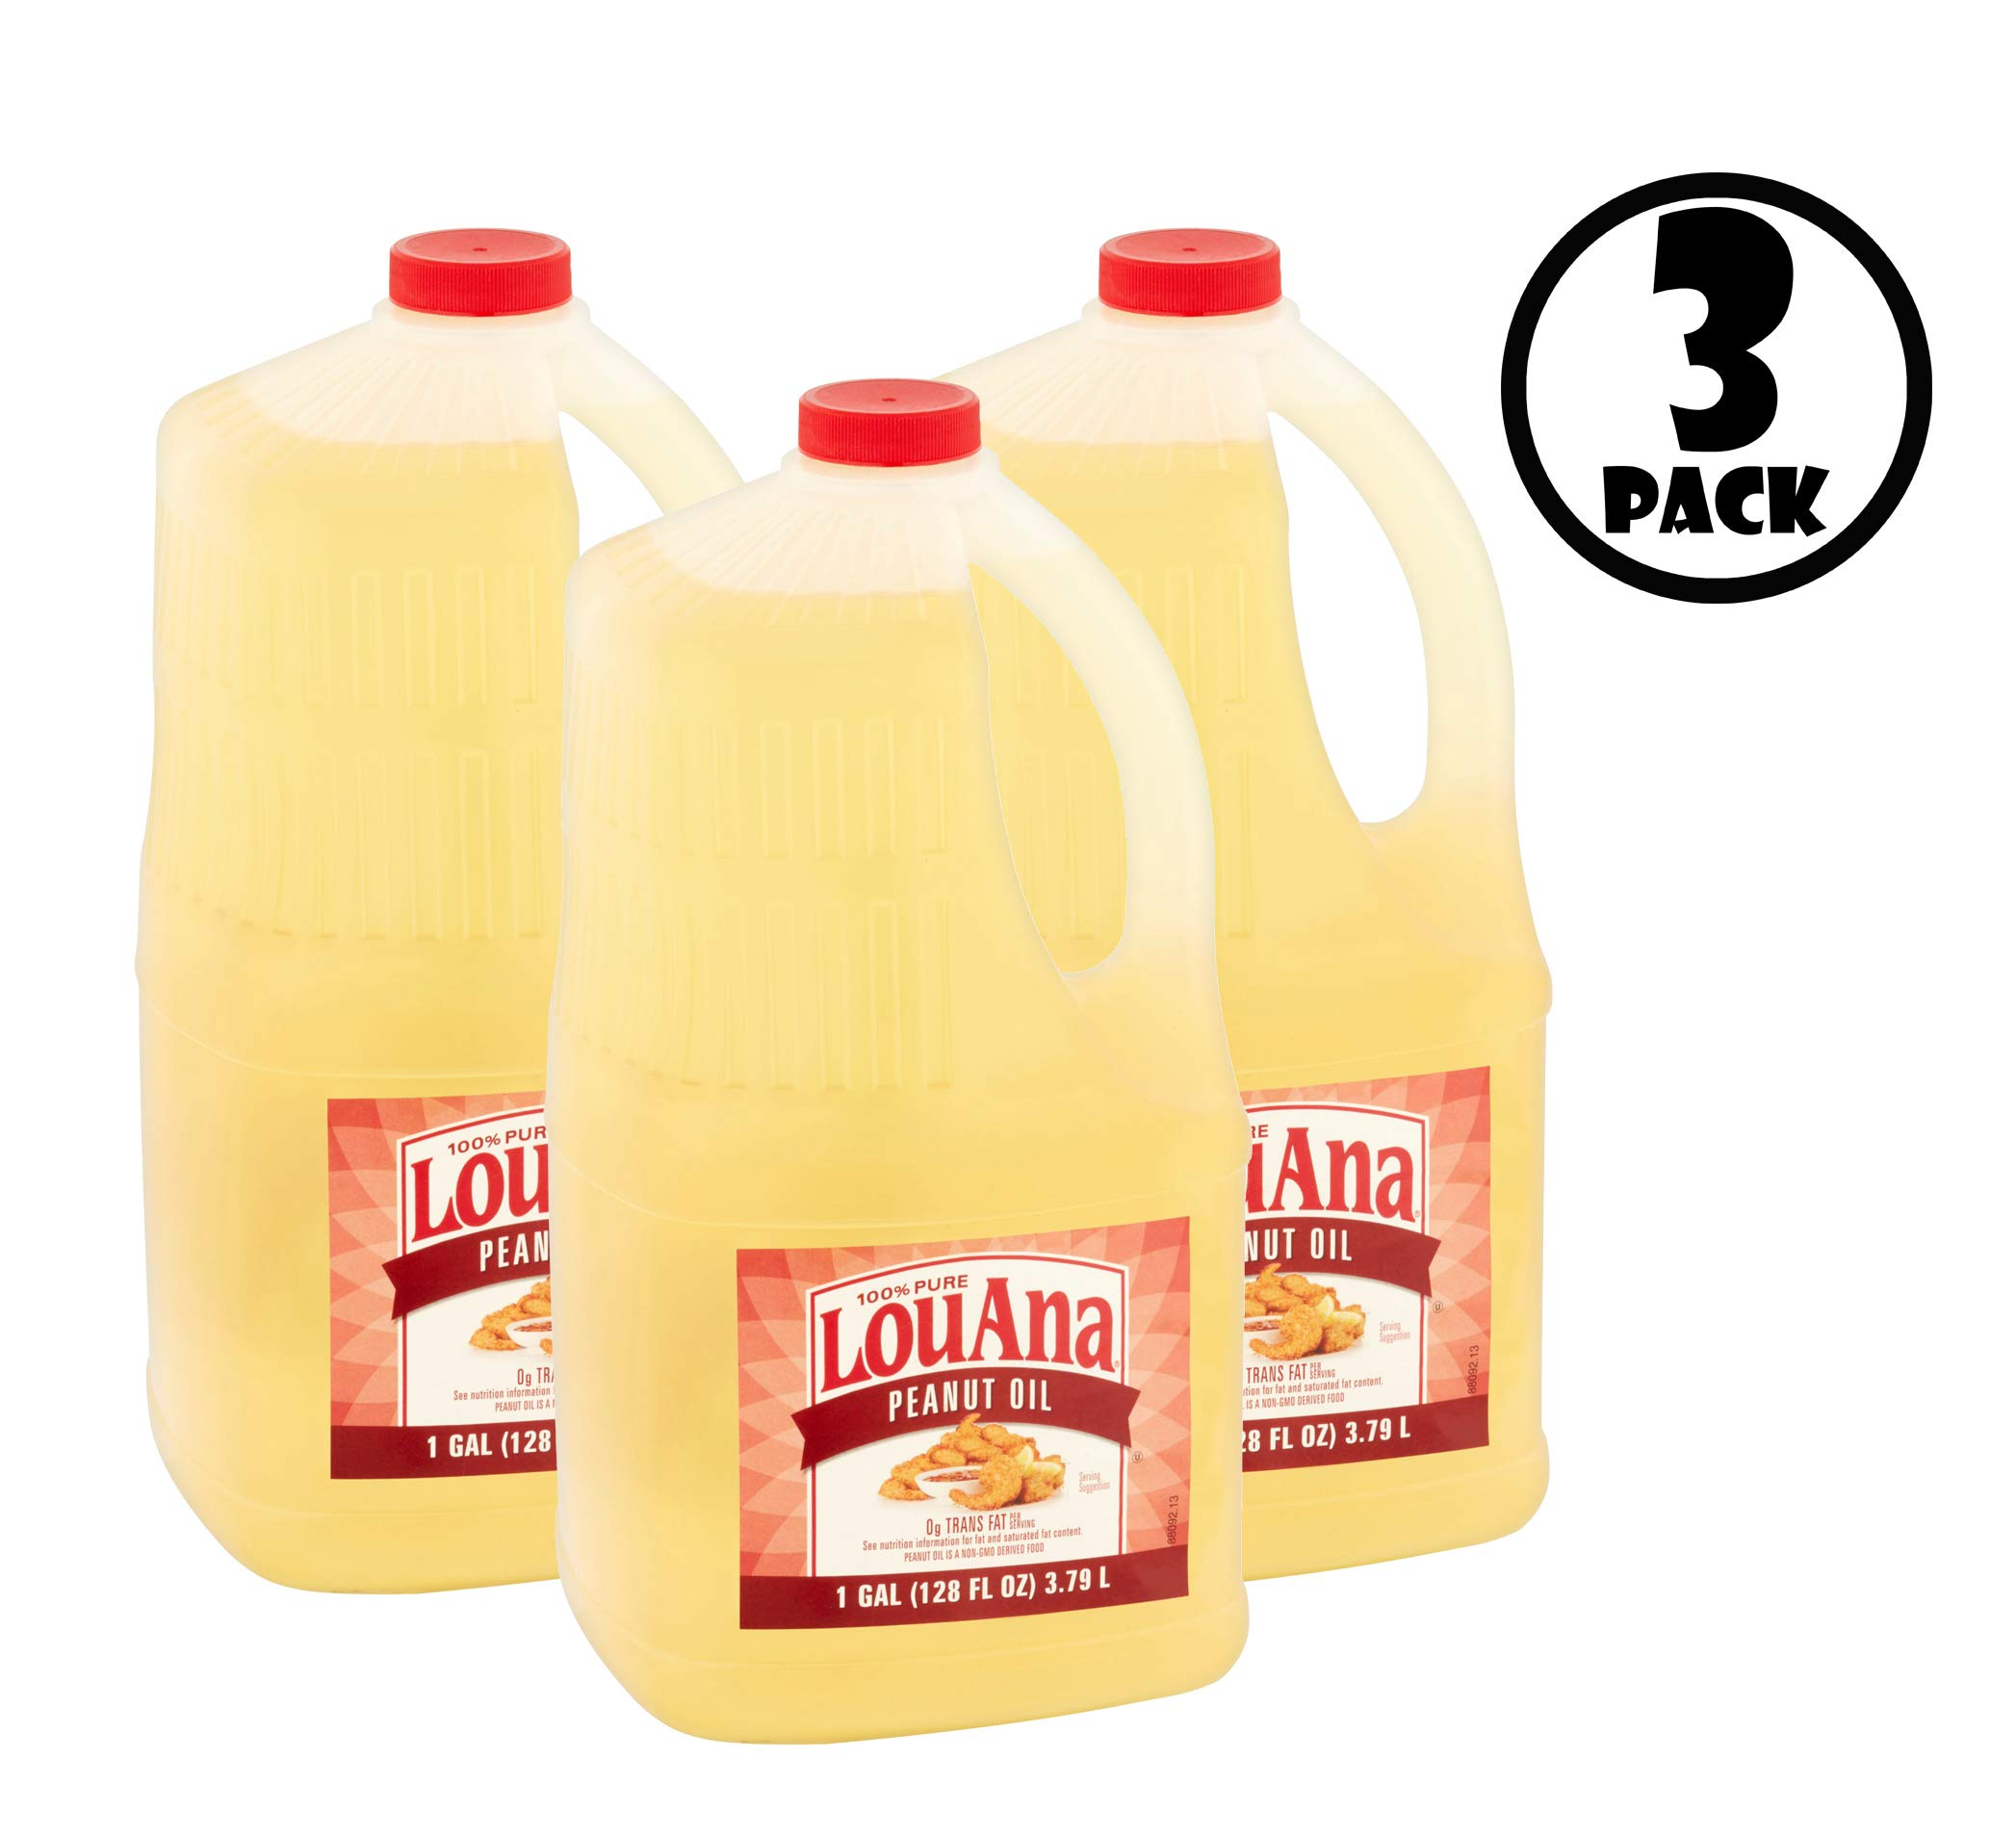 LouAna, Peanut Oil, 128.0 FL OZ by LouAna